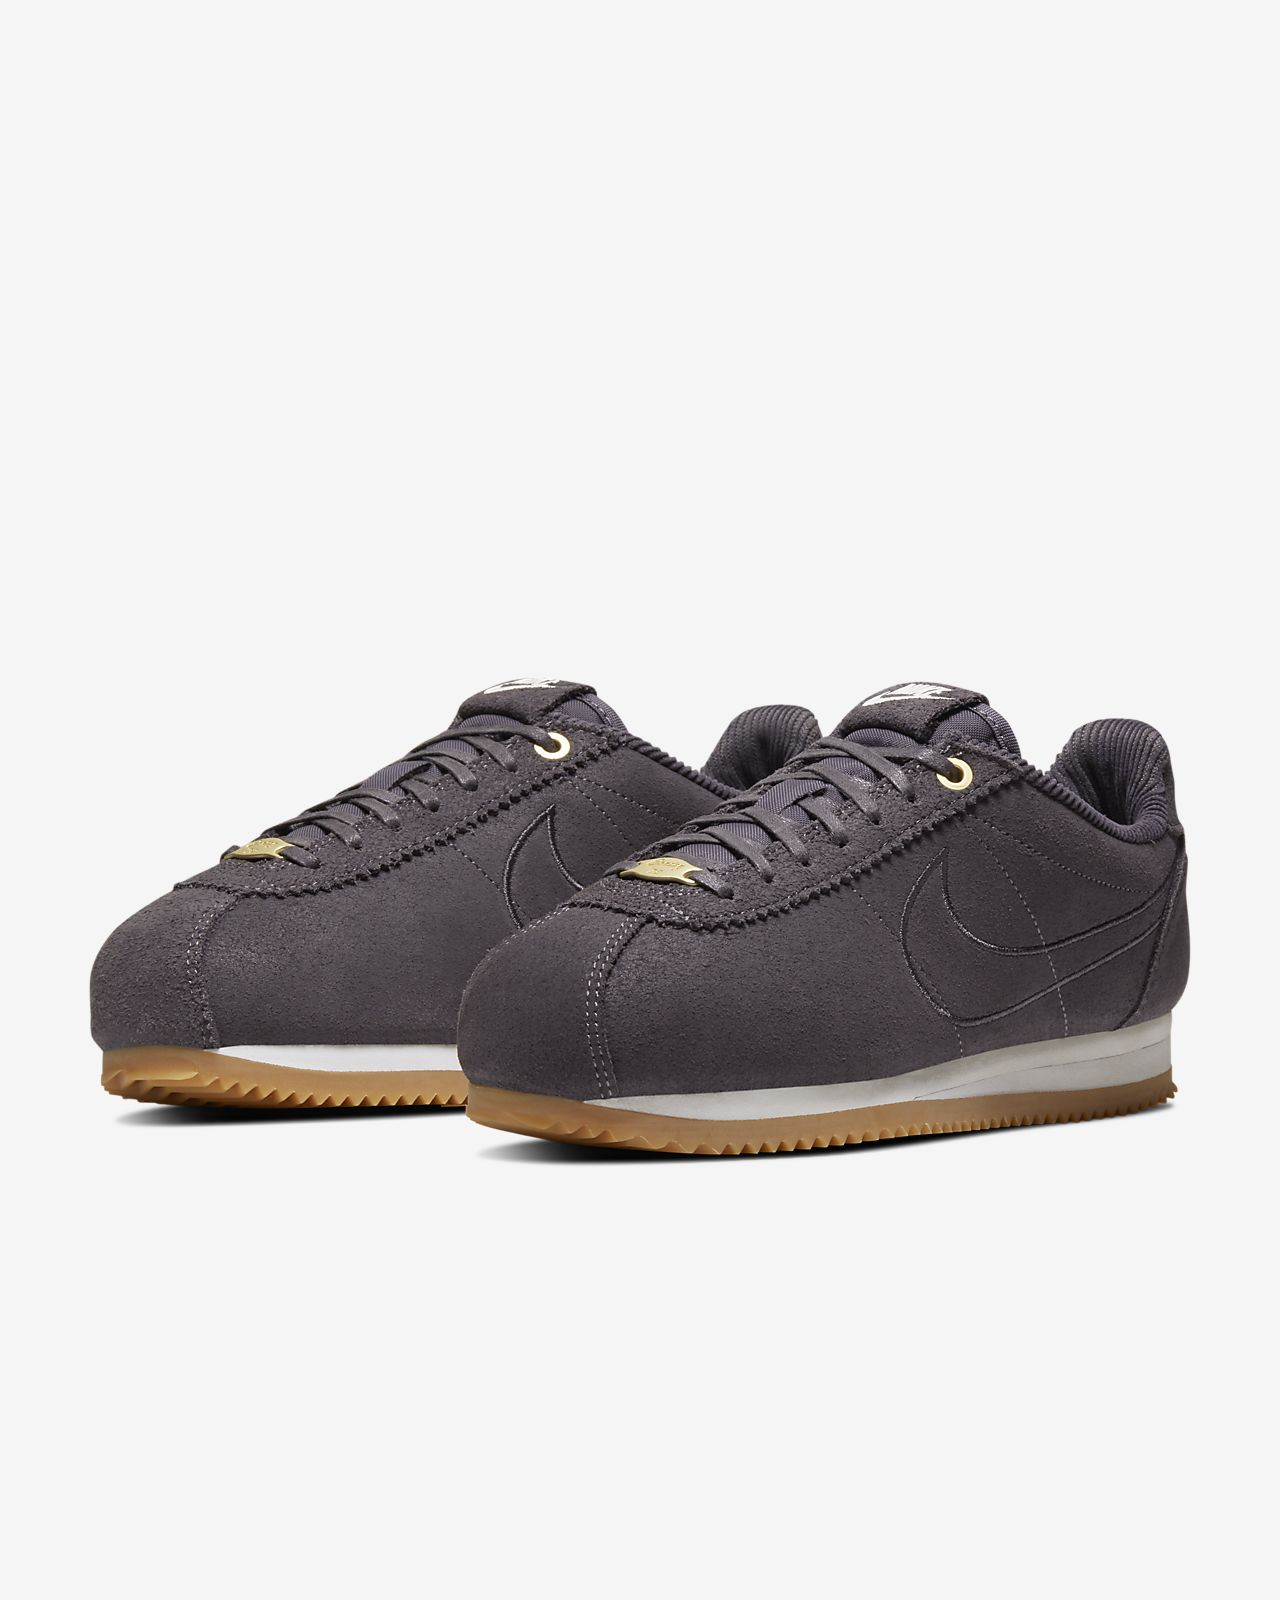 Nike Classic Cortez Premium Maria Sharapova x La Cortez Women's Shoe